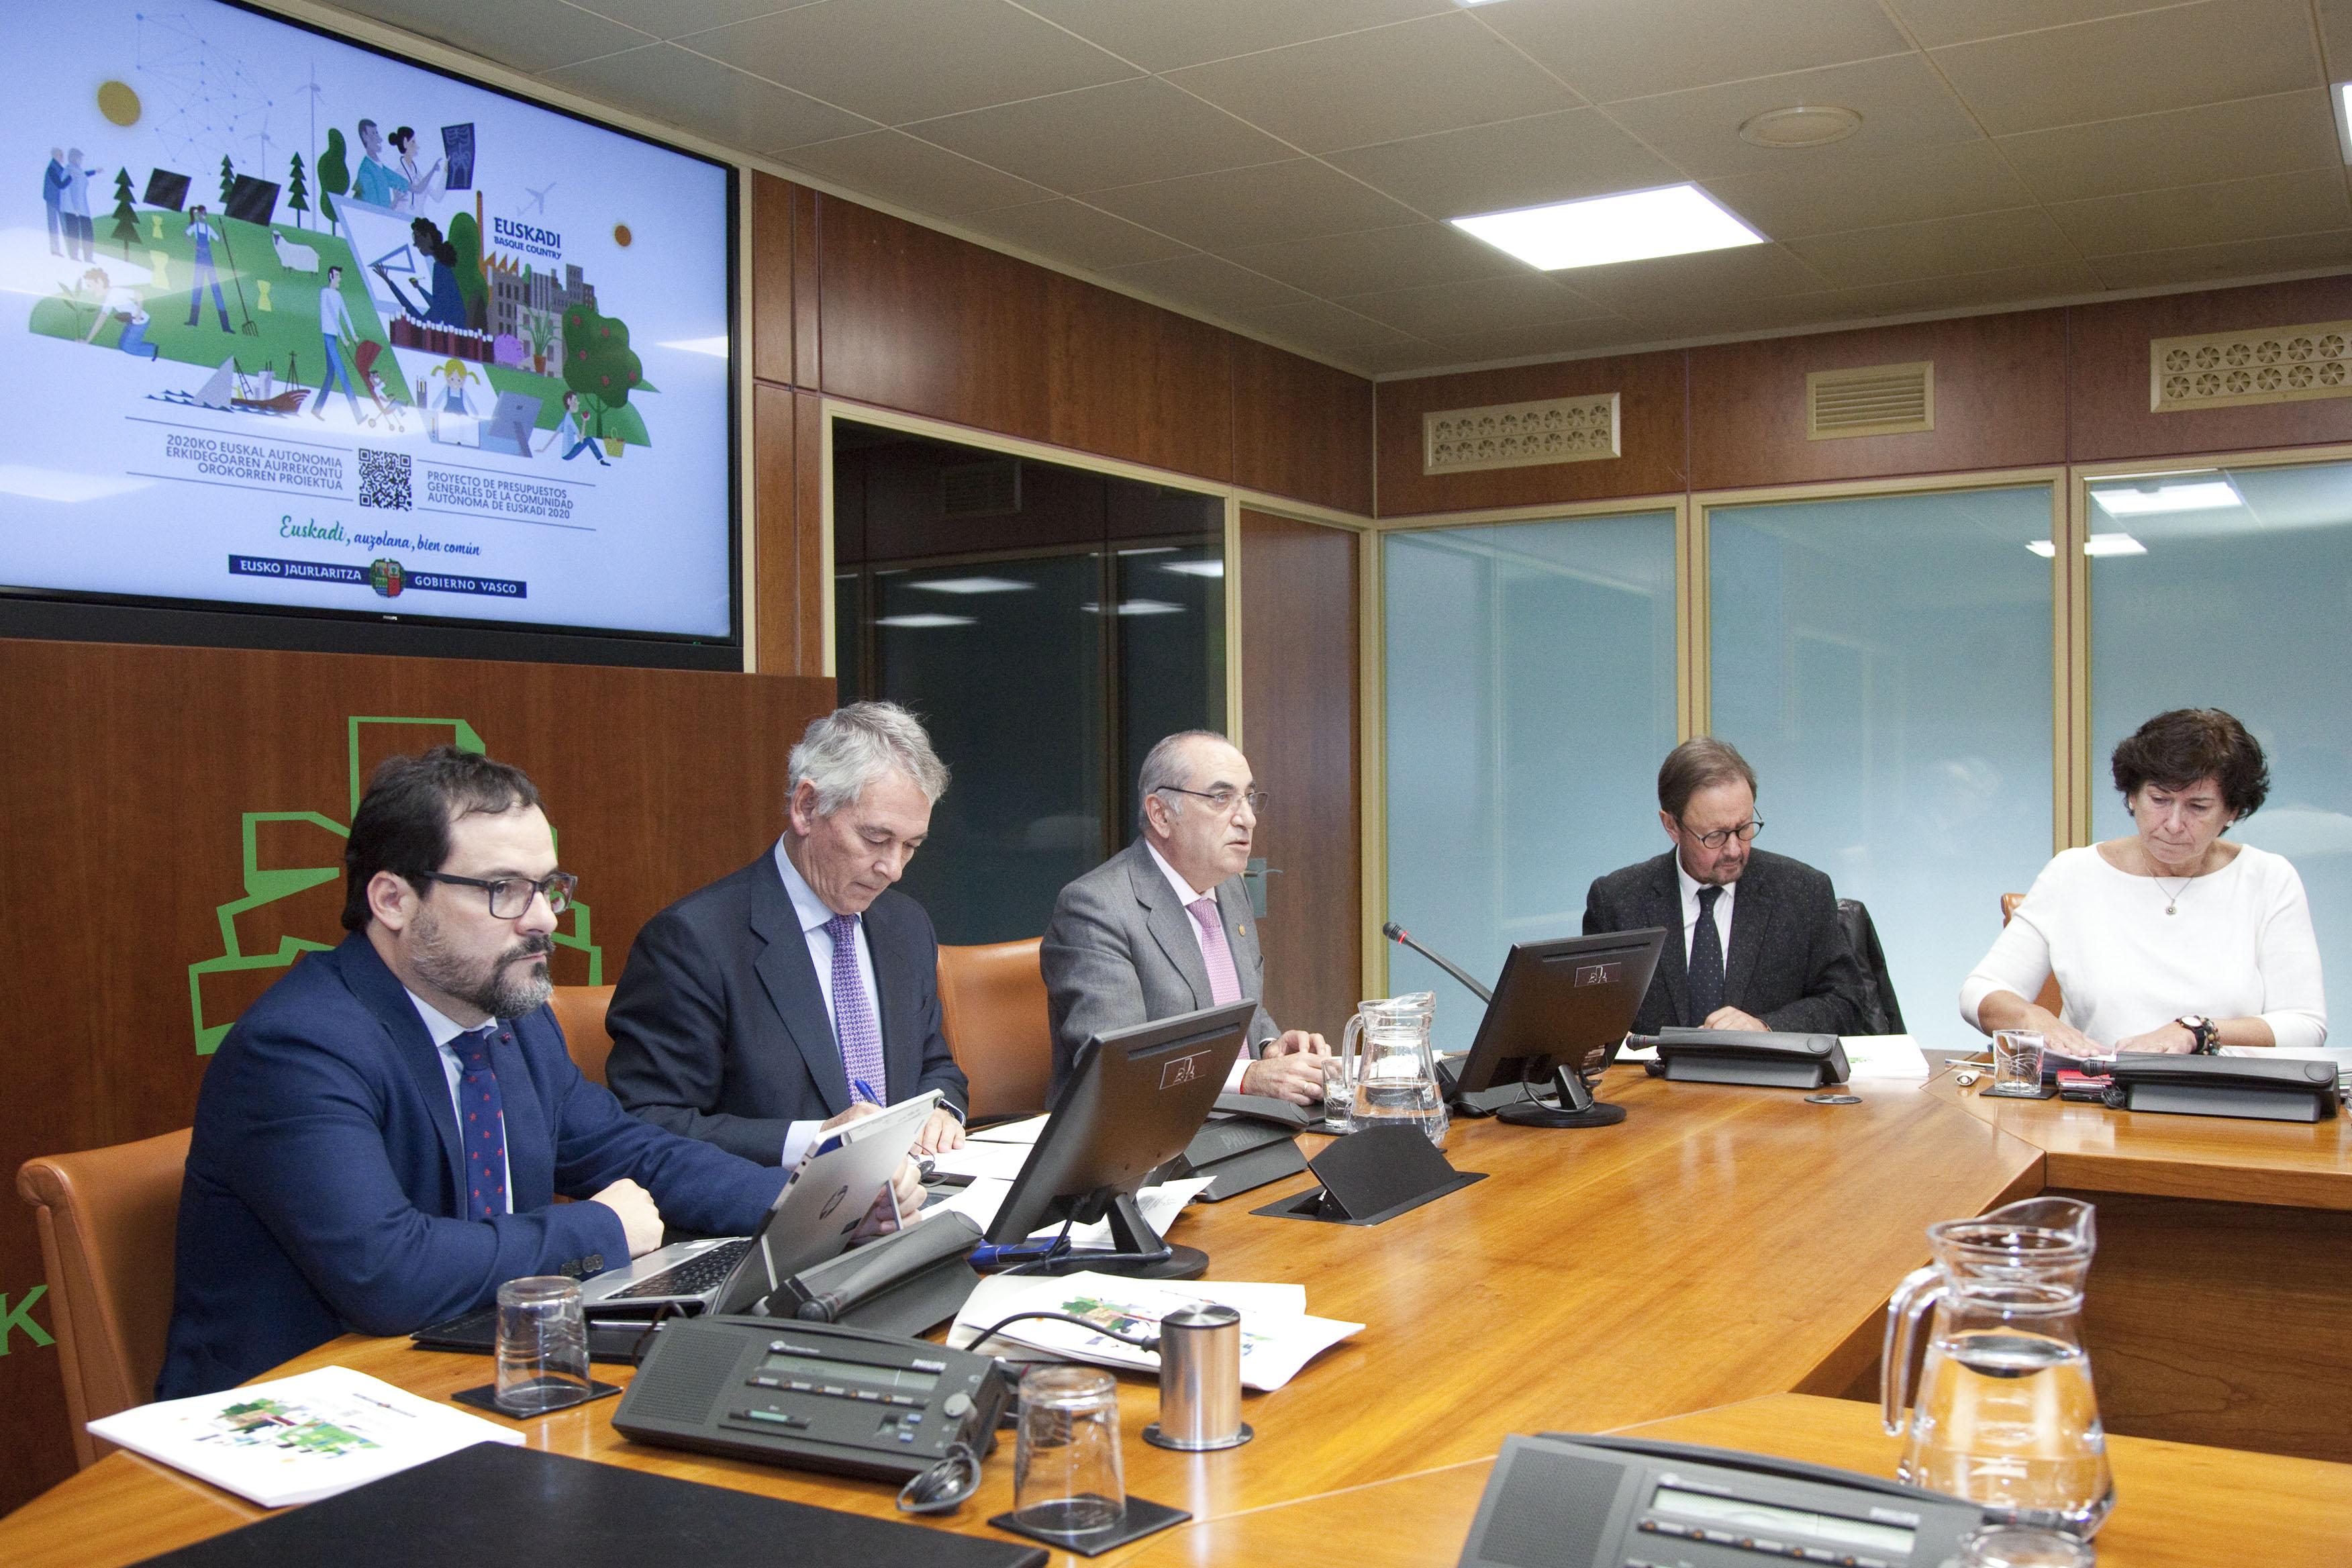 arriola_presupuestos_05.jpg